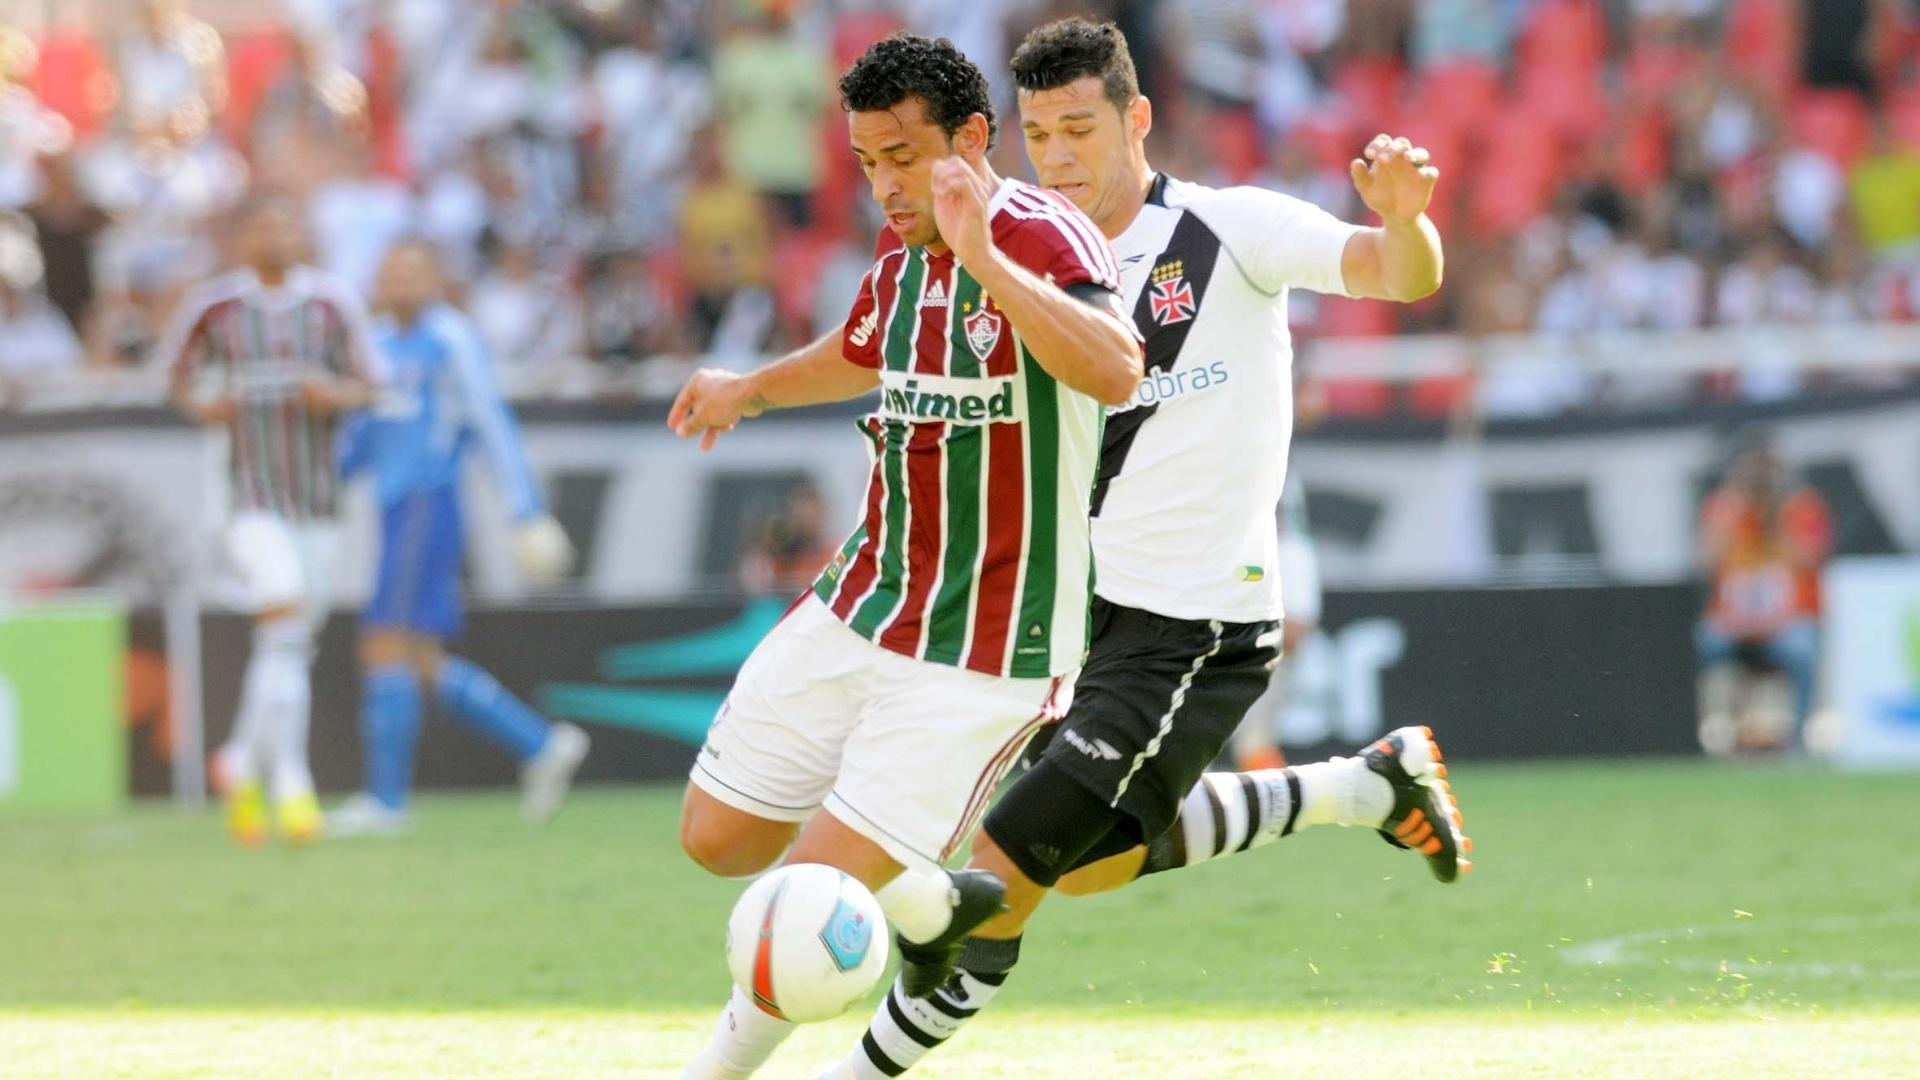 Marcado por Nilton, Fred tenta a jogada na final da Taça Guanabara